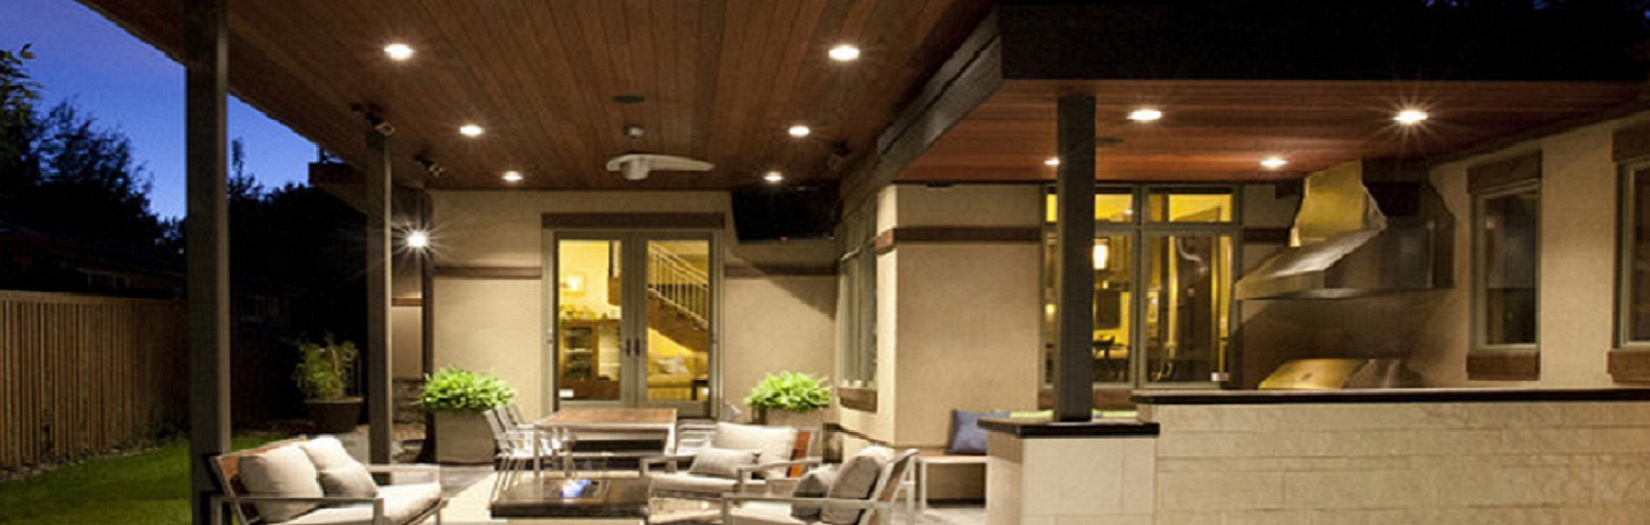 modern-patio.jpg